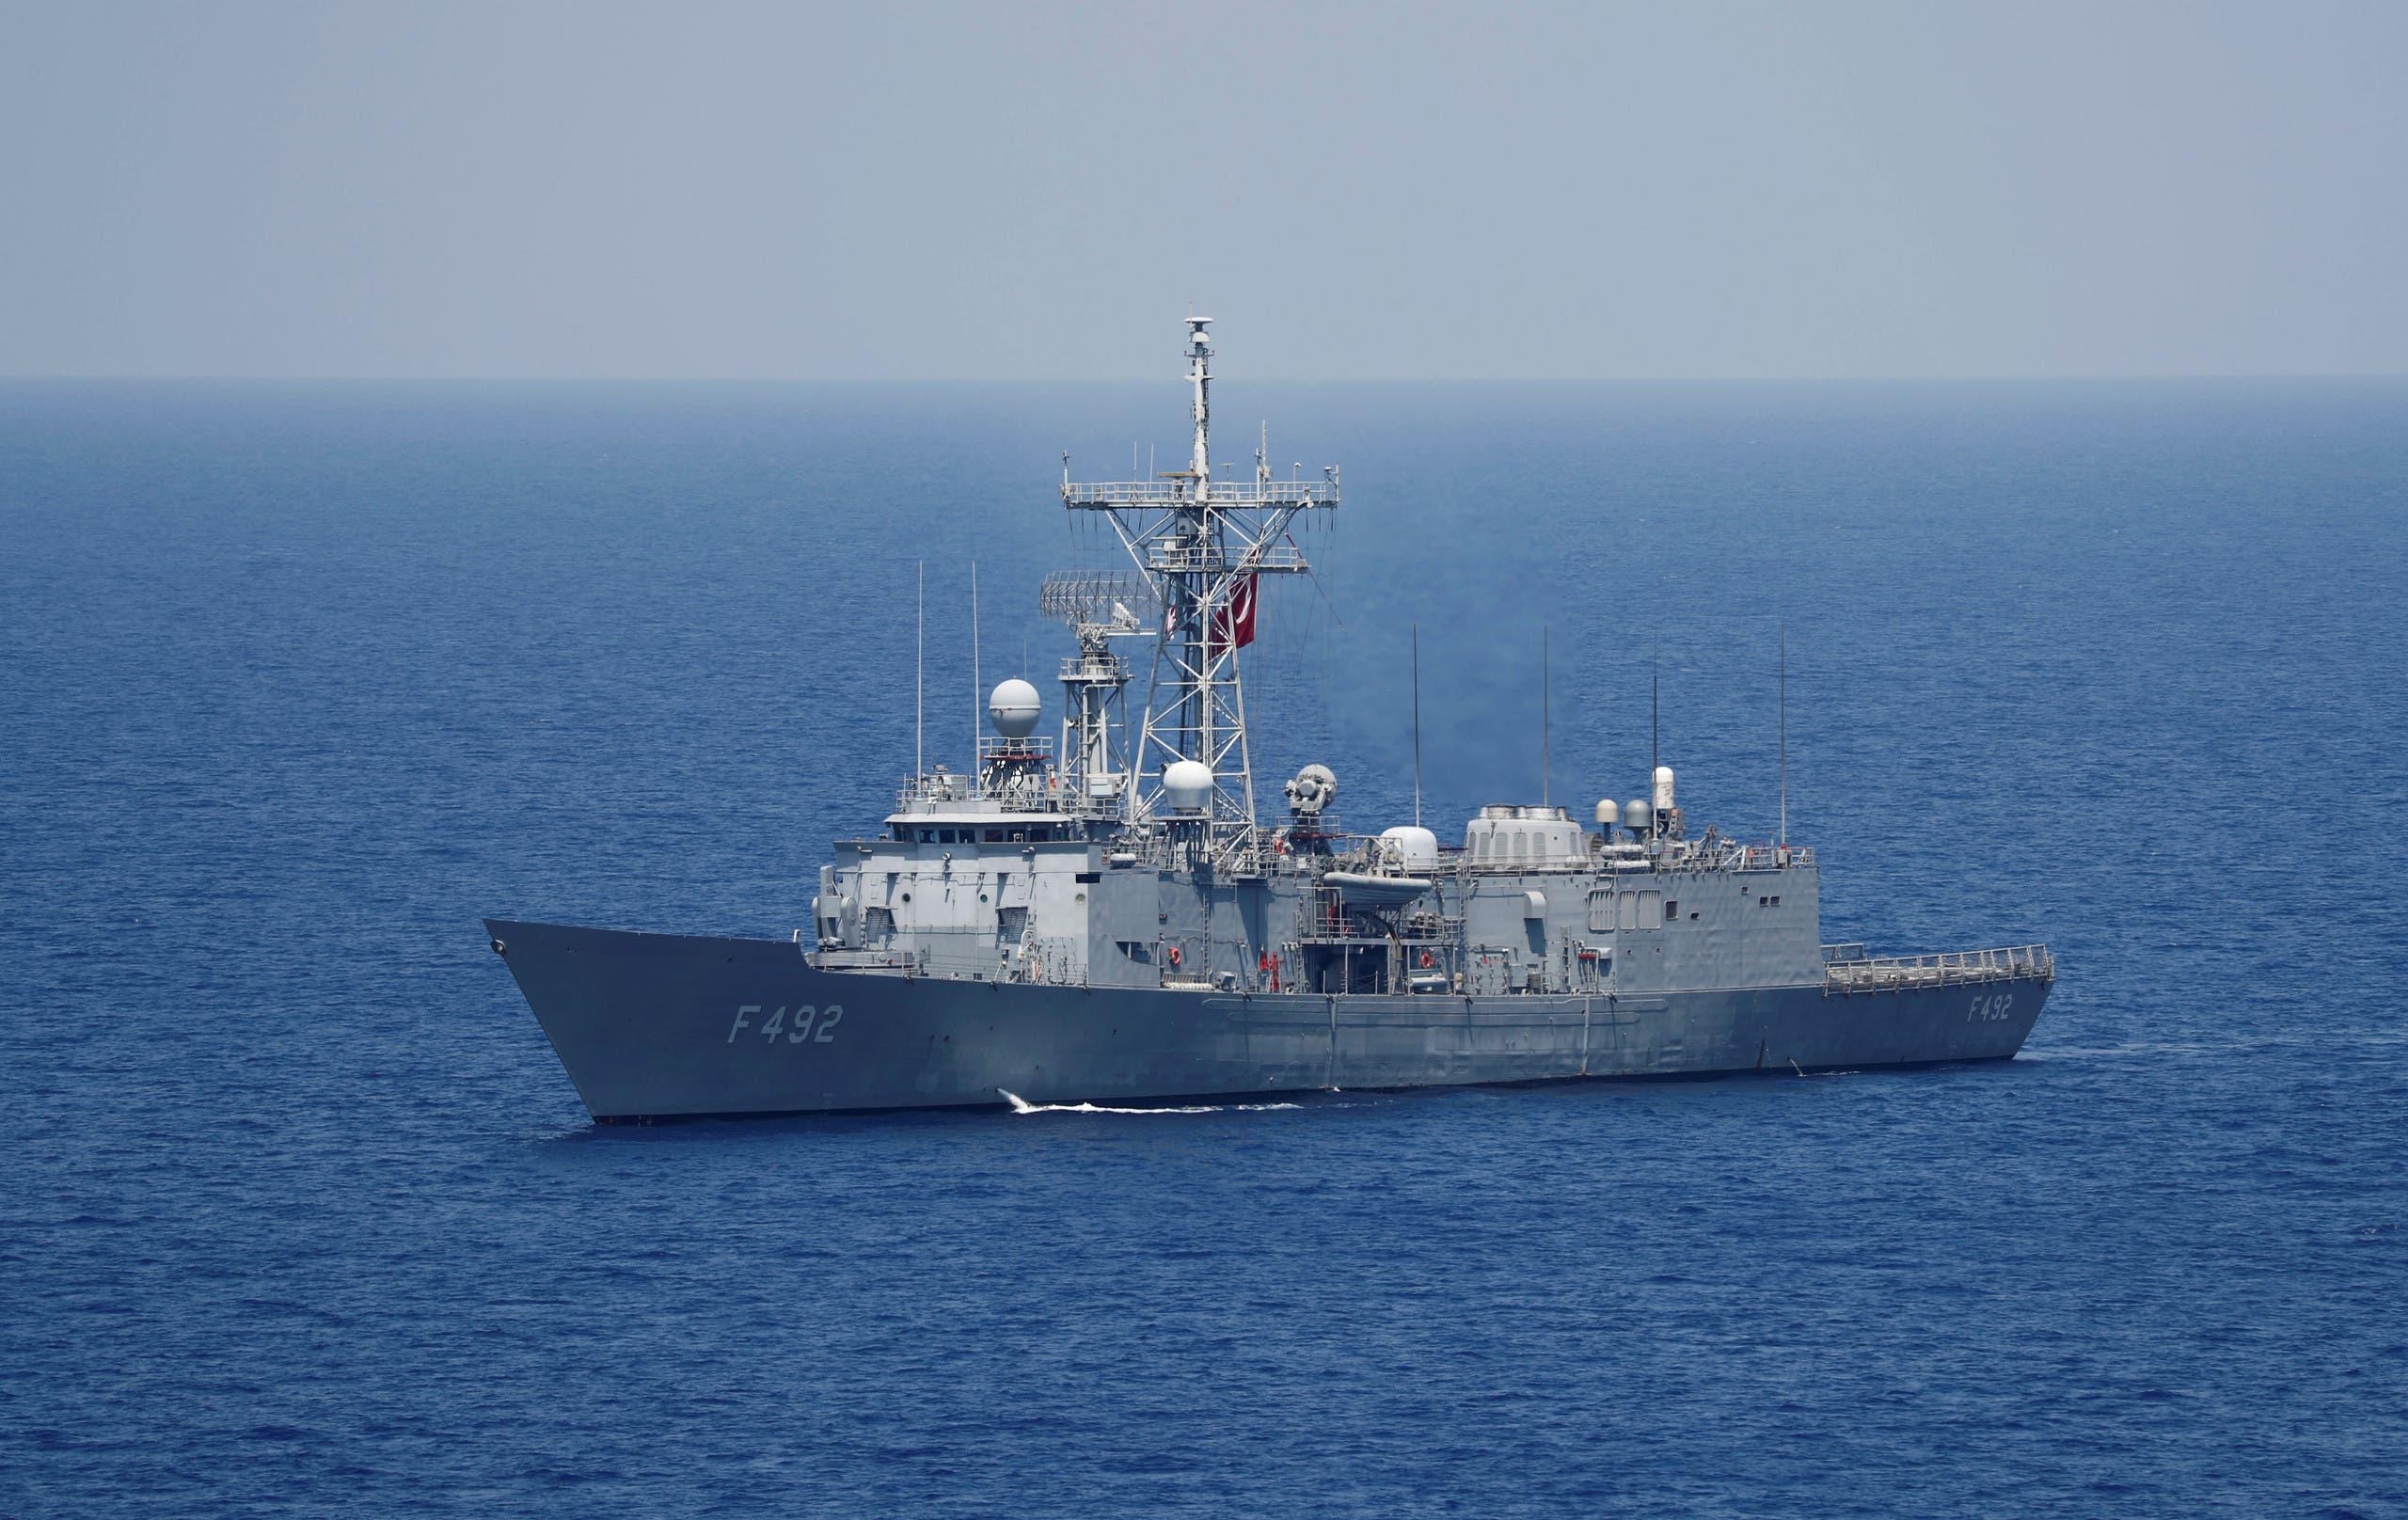 Turkish Navy frigate TCG Gemlik (F-492) escorts Turkish drilling vessel Yavuz in the eastern Mediterranean Sea off Cyprus. (File photo: Reuters)